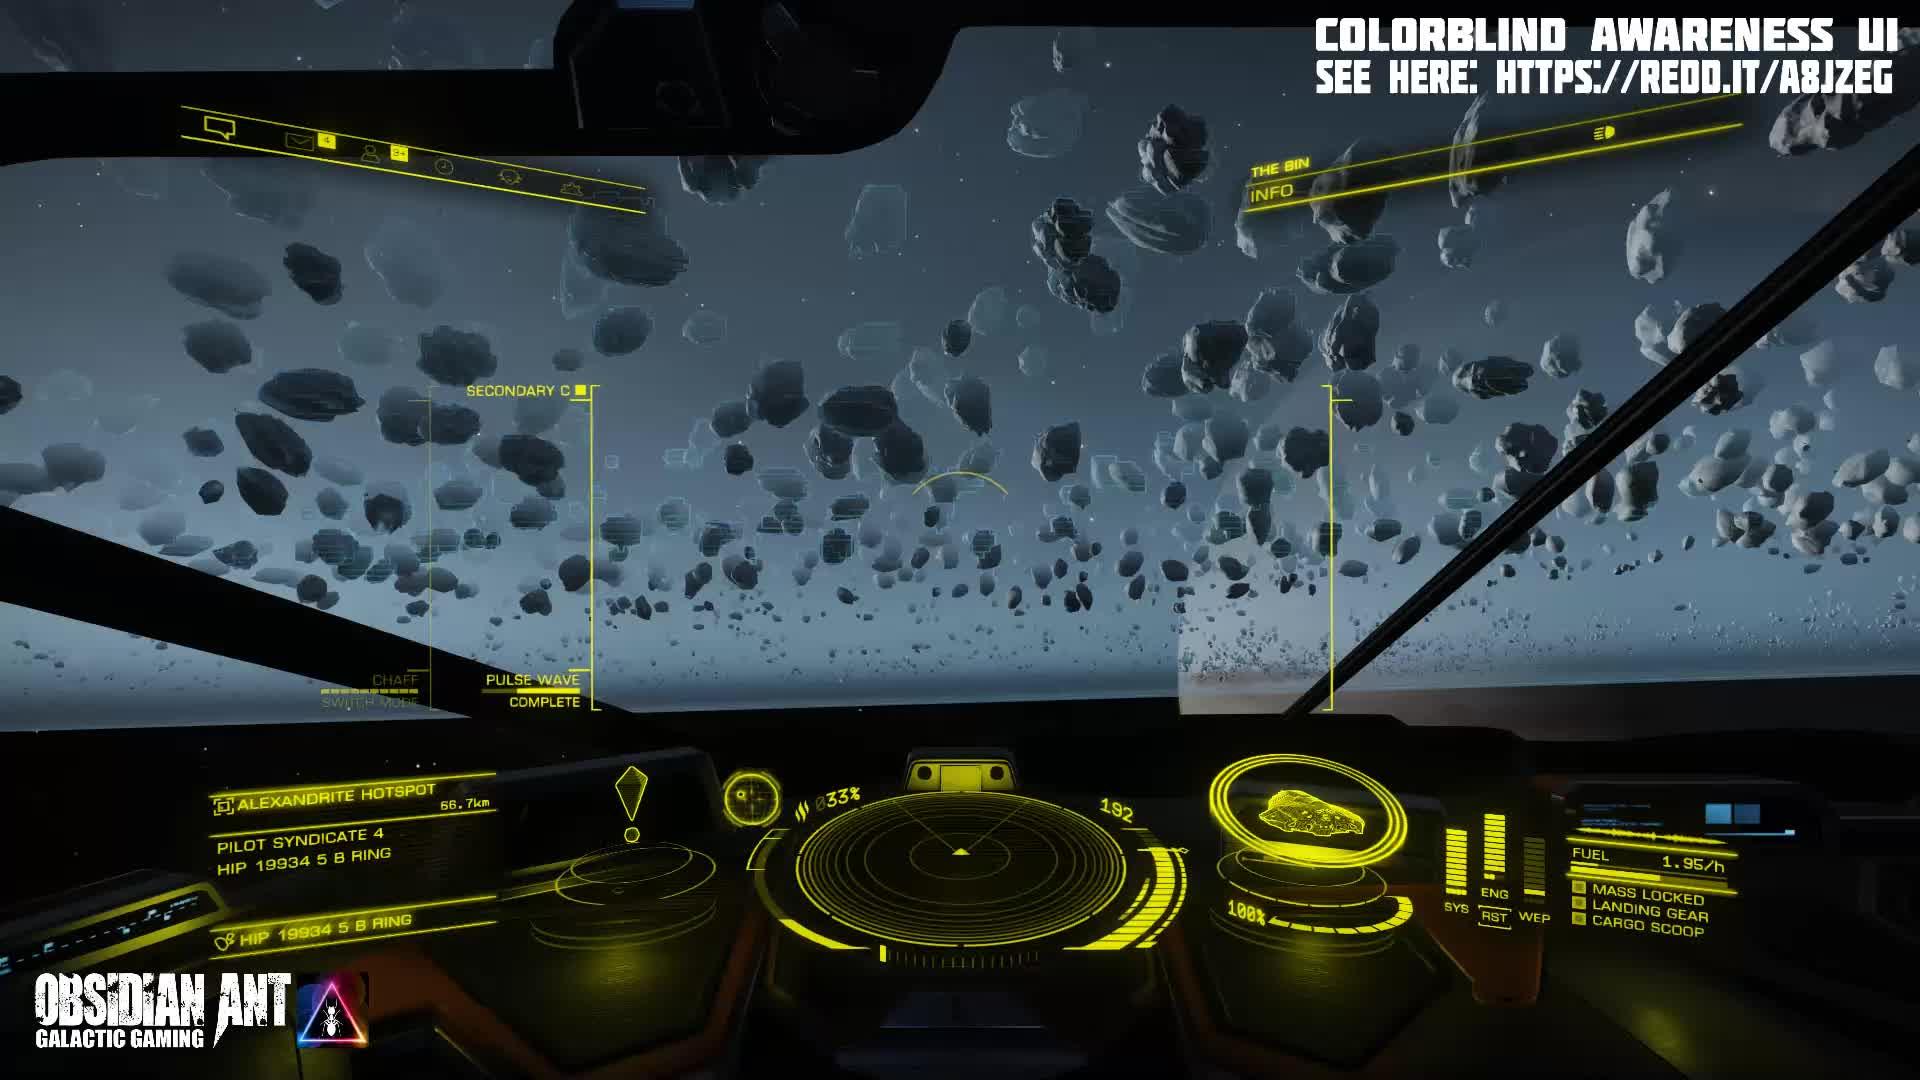 ObsidianAnt - Elite Dangerous - The Real Gold Rush - Mining